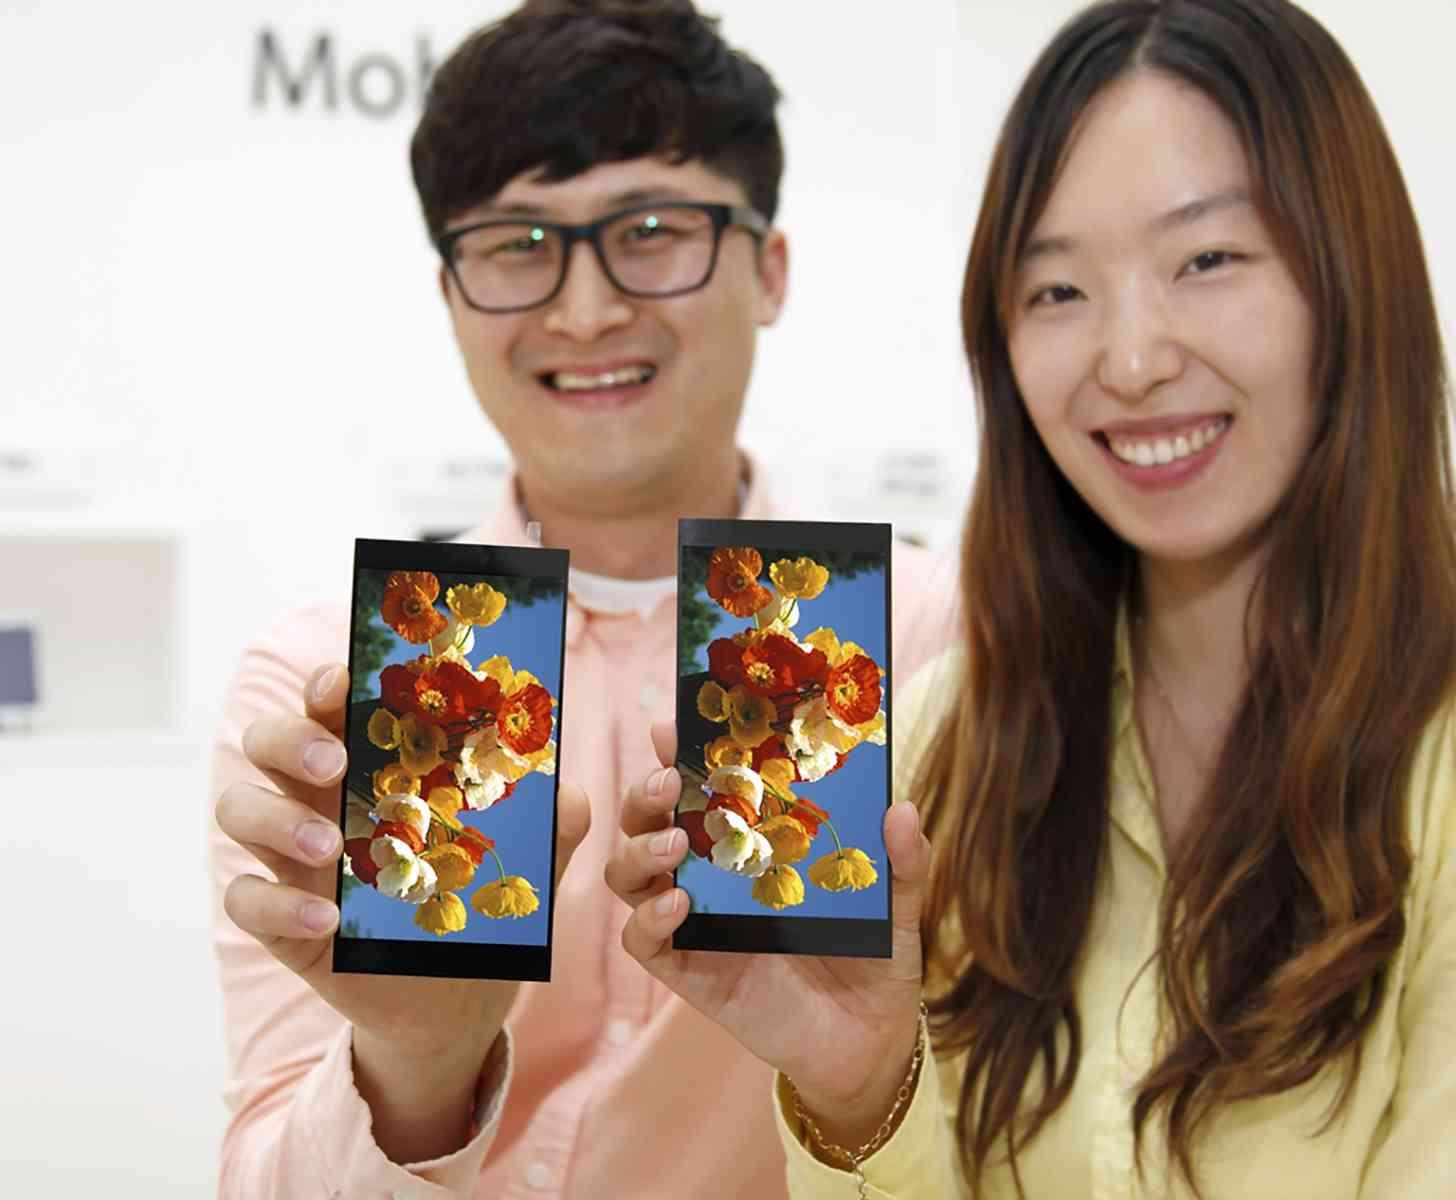 LG G4 5.5-inch QuadHD LCD panel